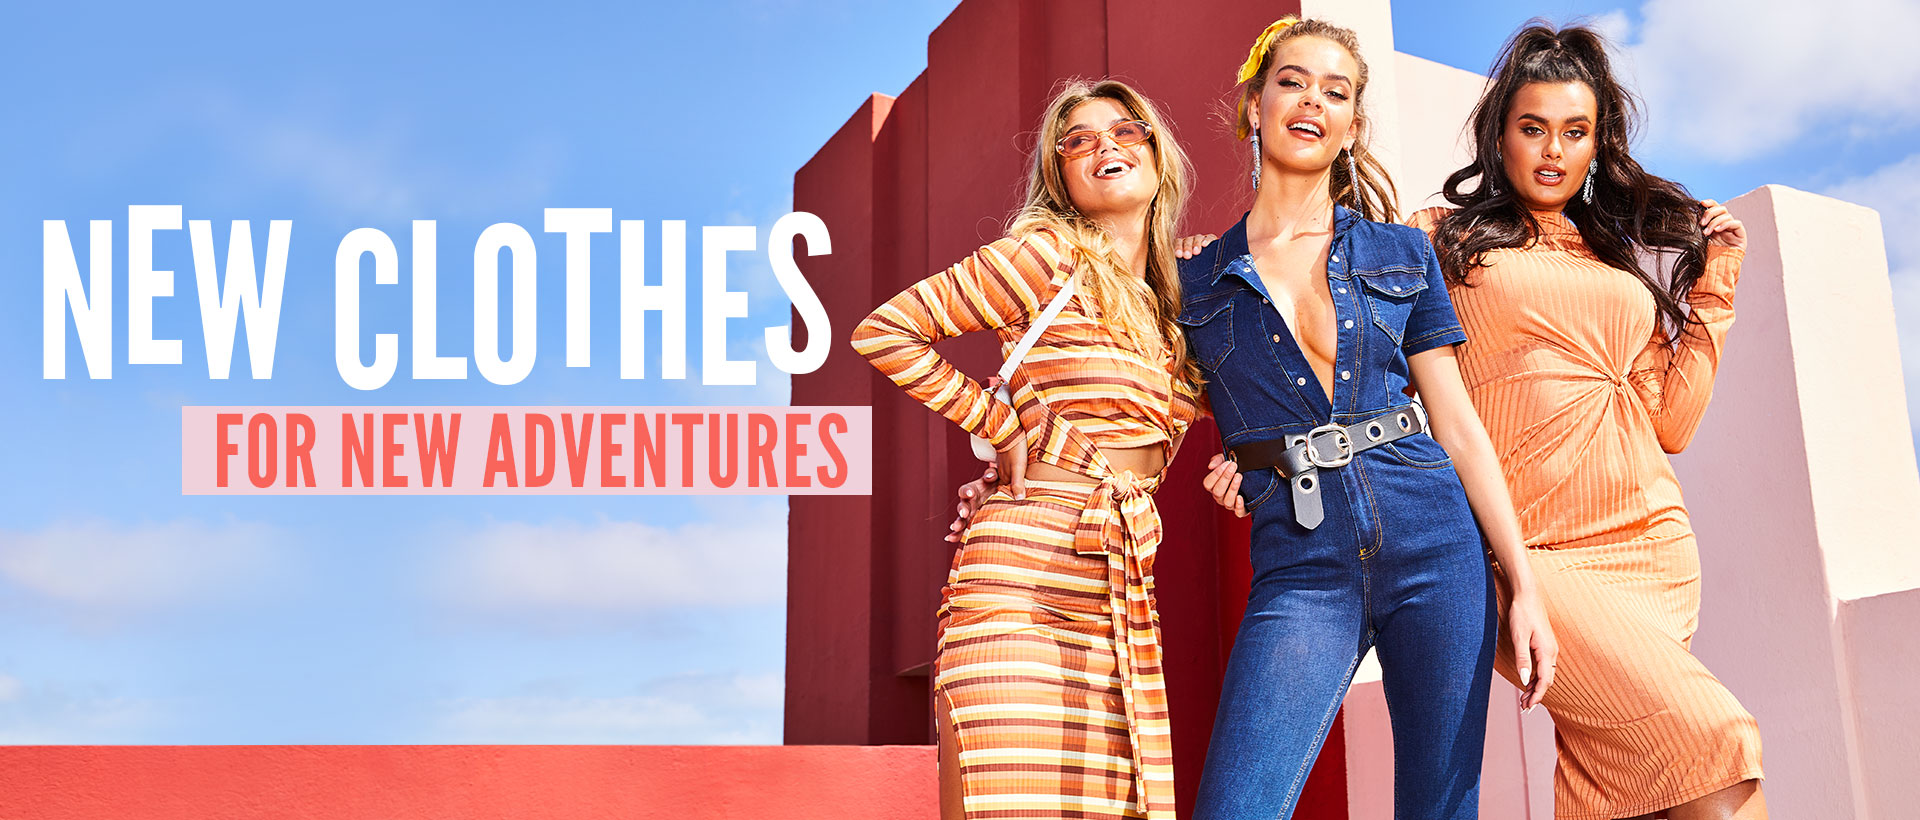 fe33d8c6505e Clothes | Women's & Men's Clothing & Fashion | Online Shopping – boohoo